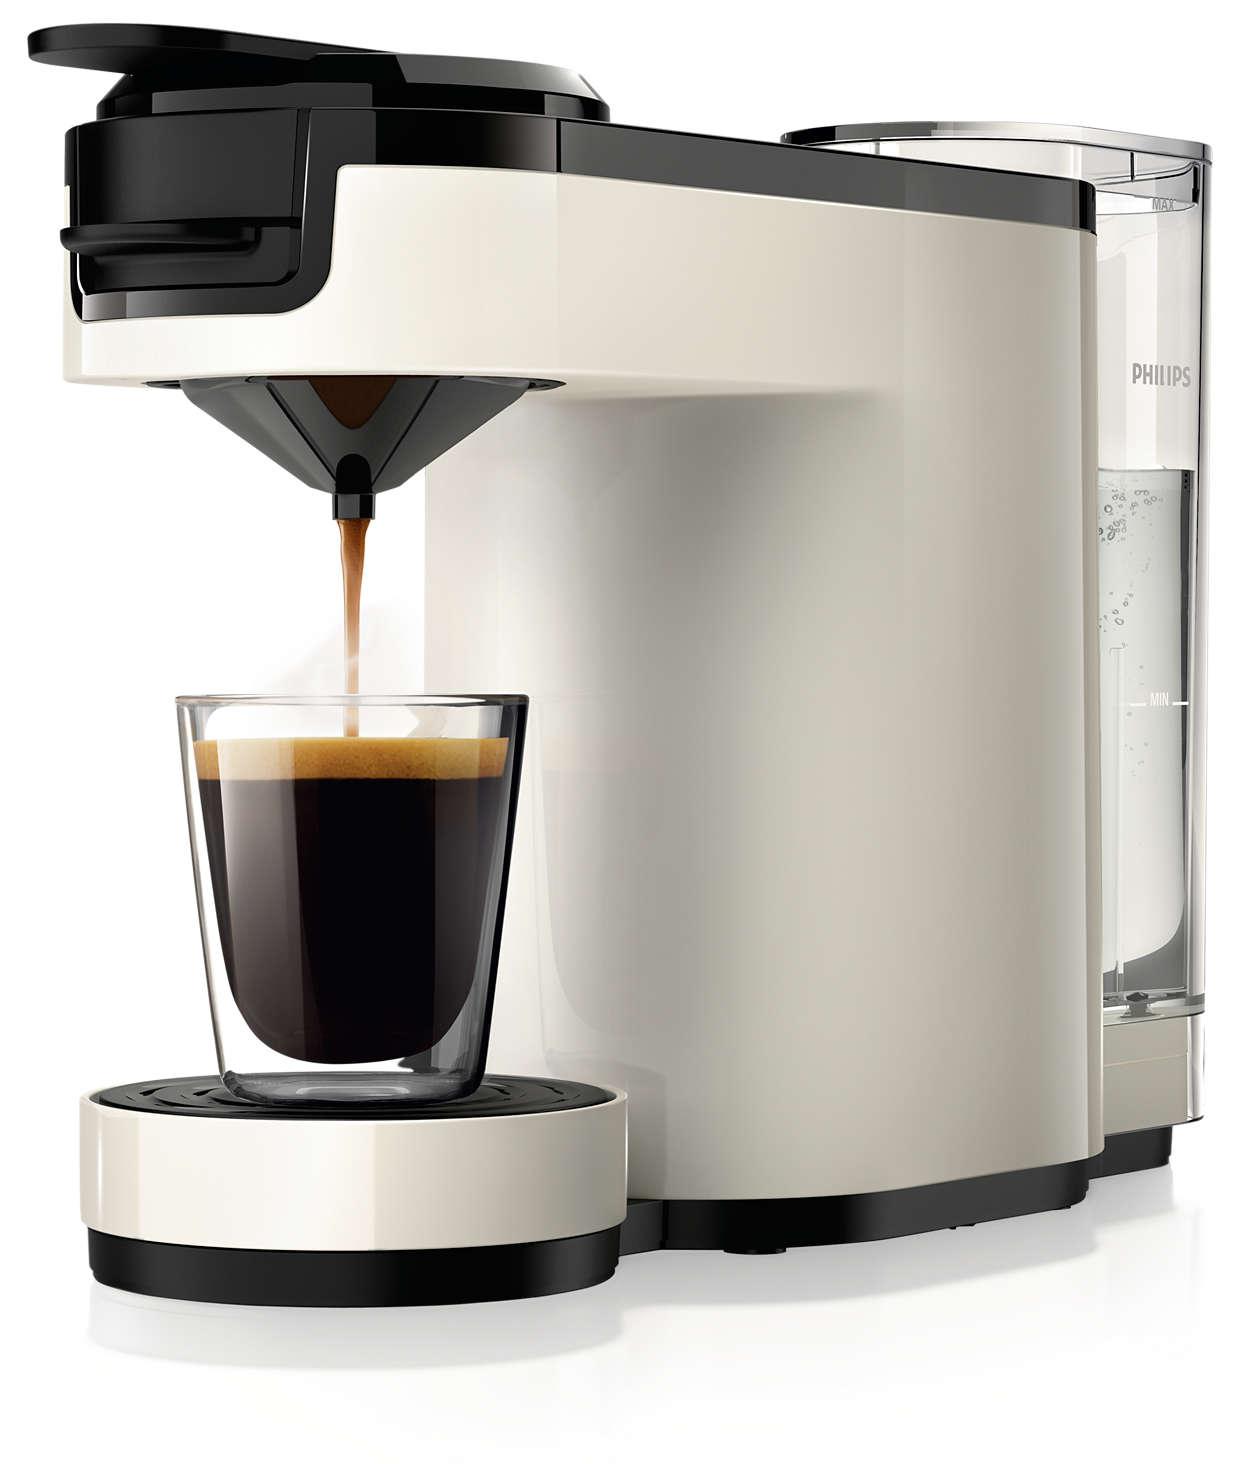 up kaffeepadmaschine hd7880 10 senseo. Black Bedroom Furniture Sets. Home Design Ideas